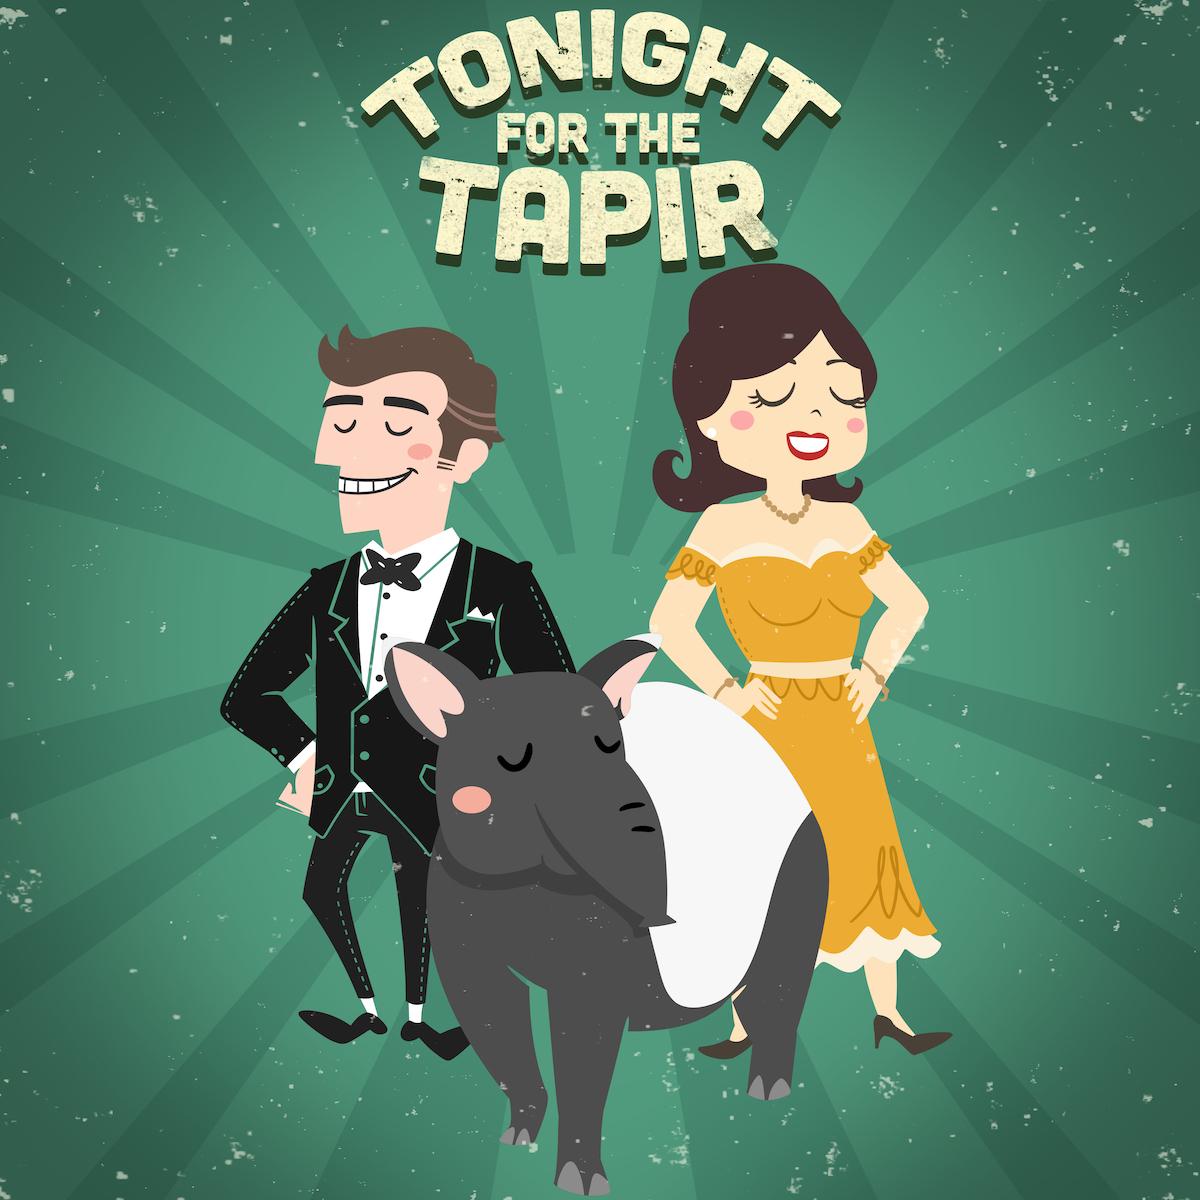 Tonight For The Tapir!